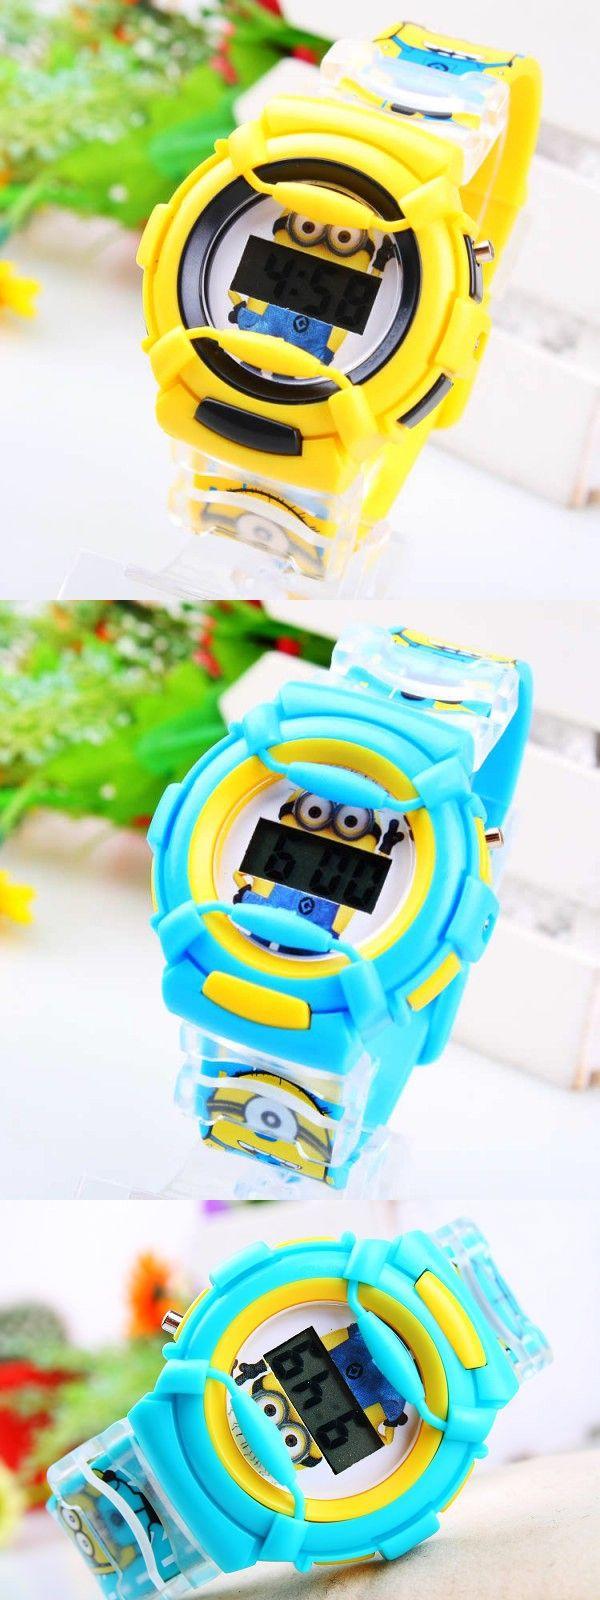 HOT !New arrival Minions Watch Children 3D Eye Despicable Me Minion Fashion Cartoon digital kids Wrist Watch